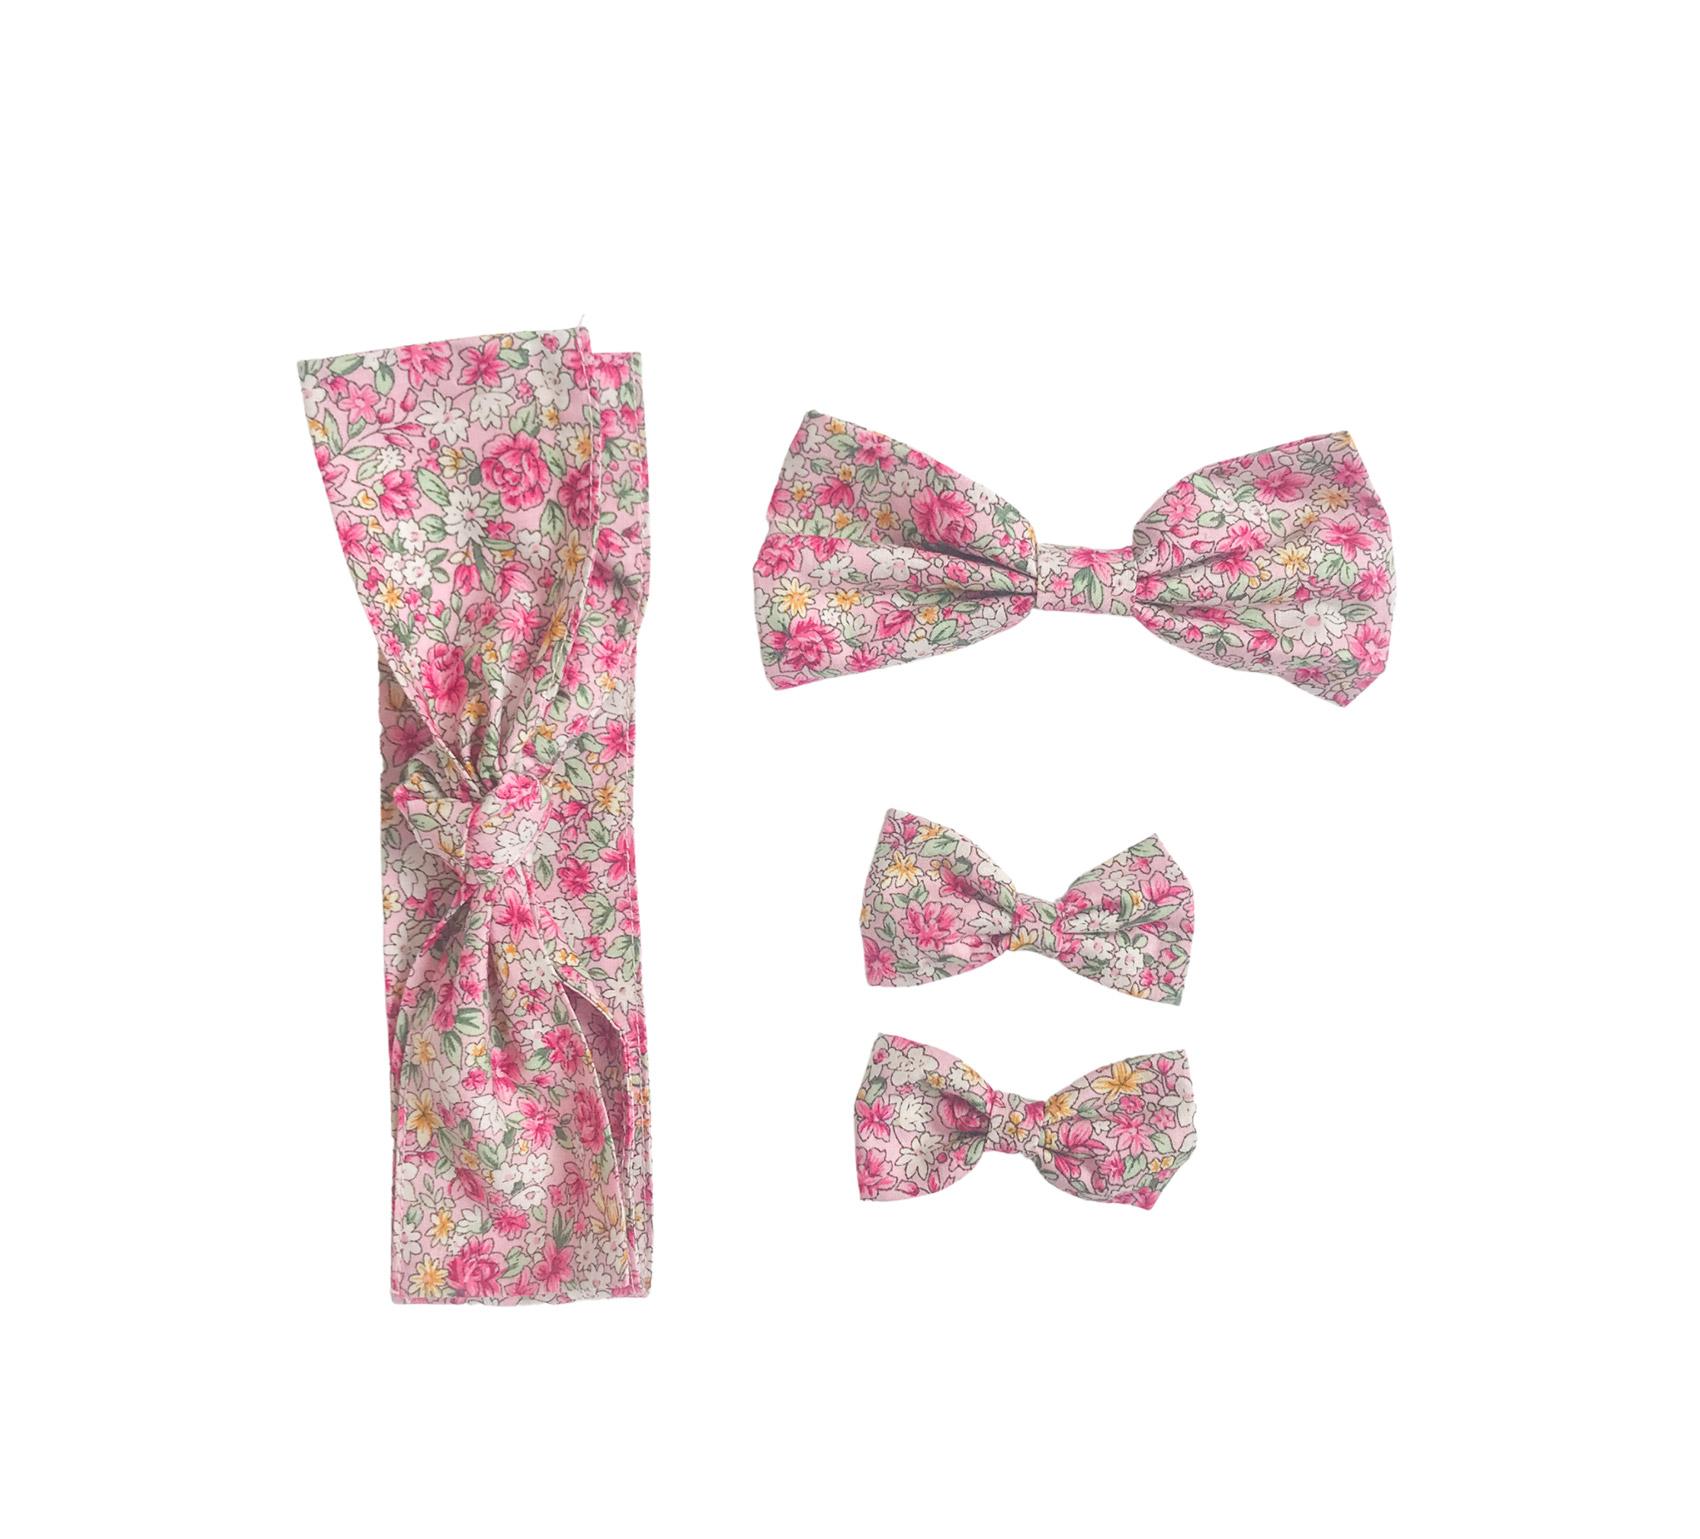 Rosalie Floral Accessories